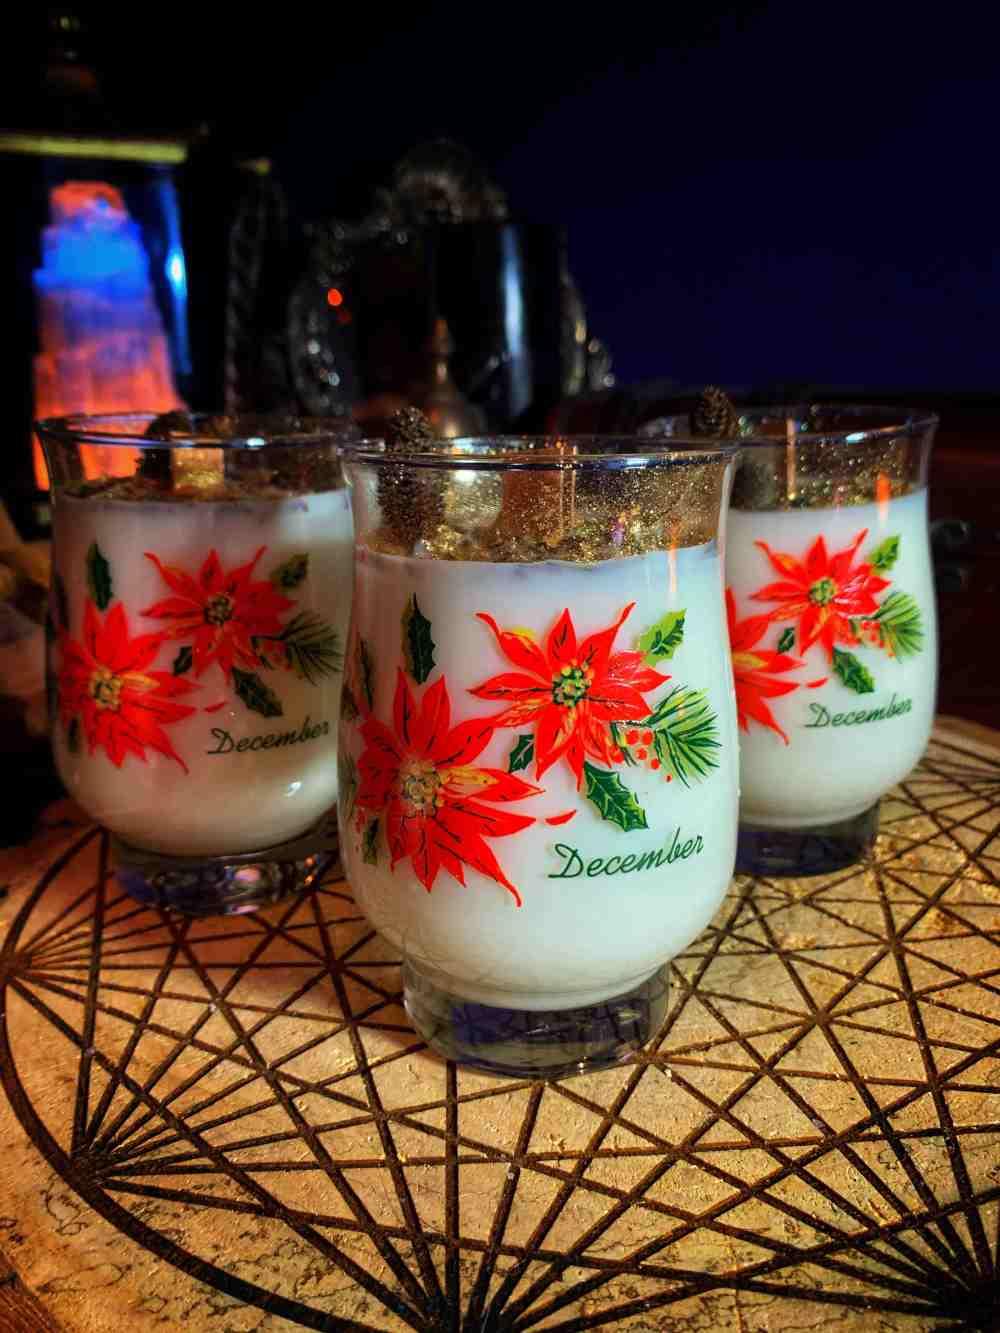 Yuletide Poinsettia Candles Vintage